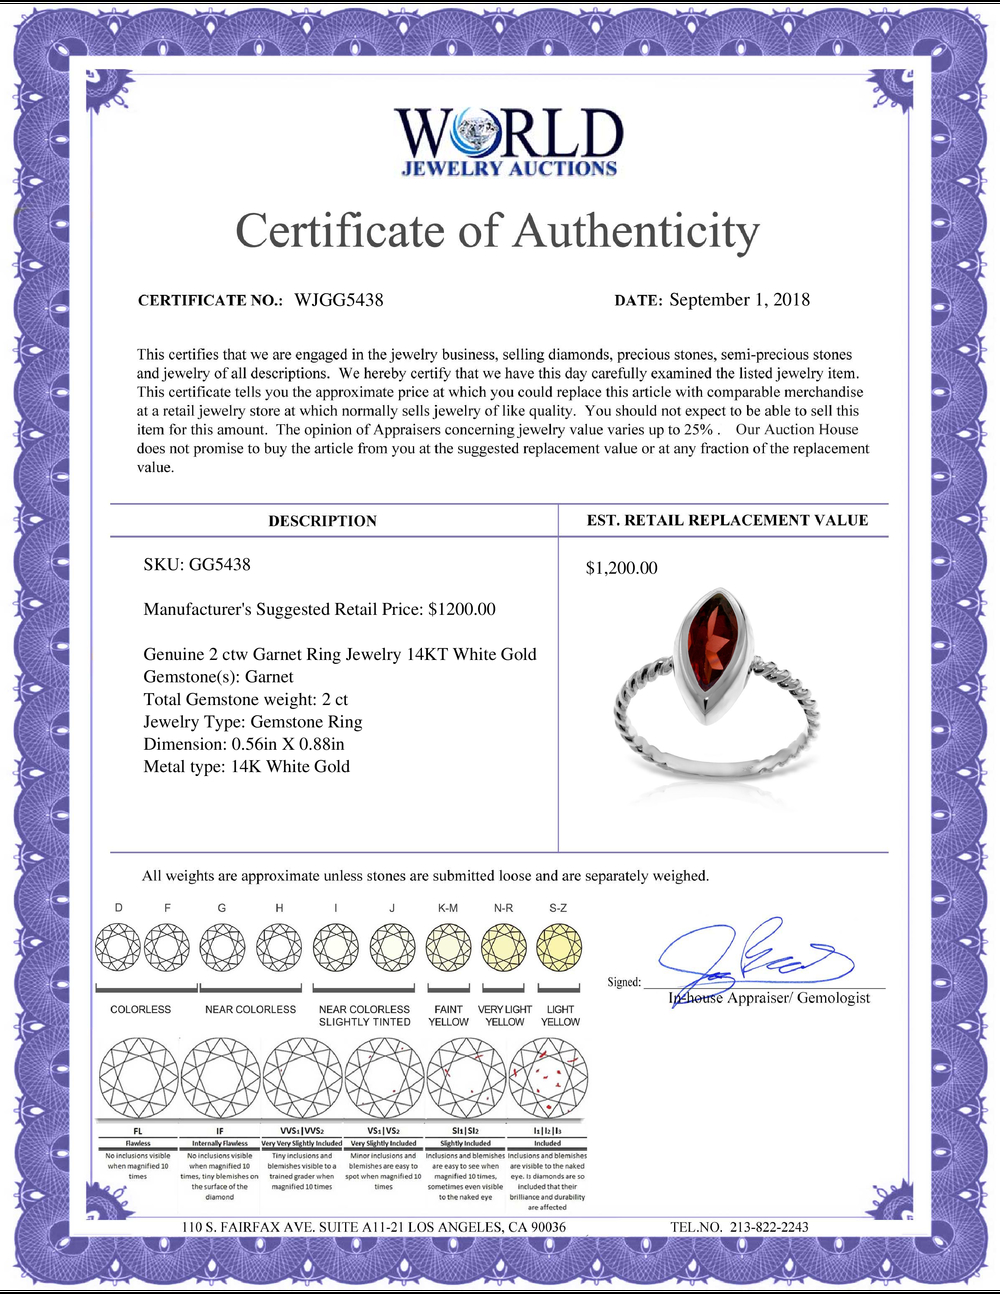 Lot 4127: Genuine 2 ctw Garnet Ring Jewelry 14KT White Gold - REF-39M3T